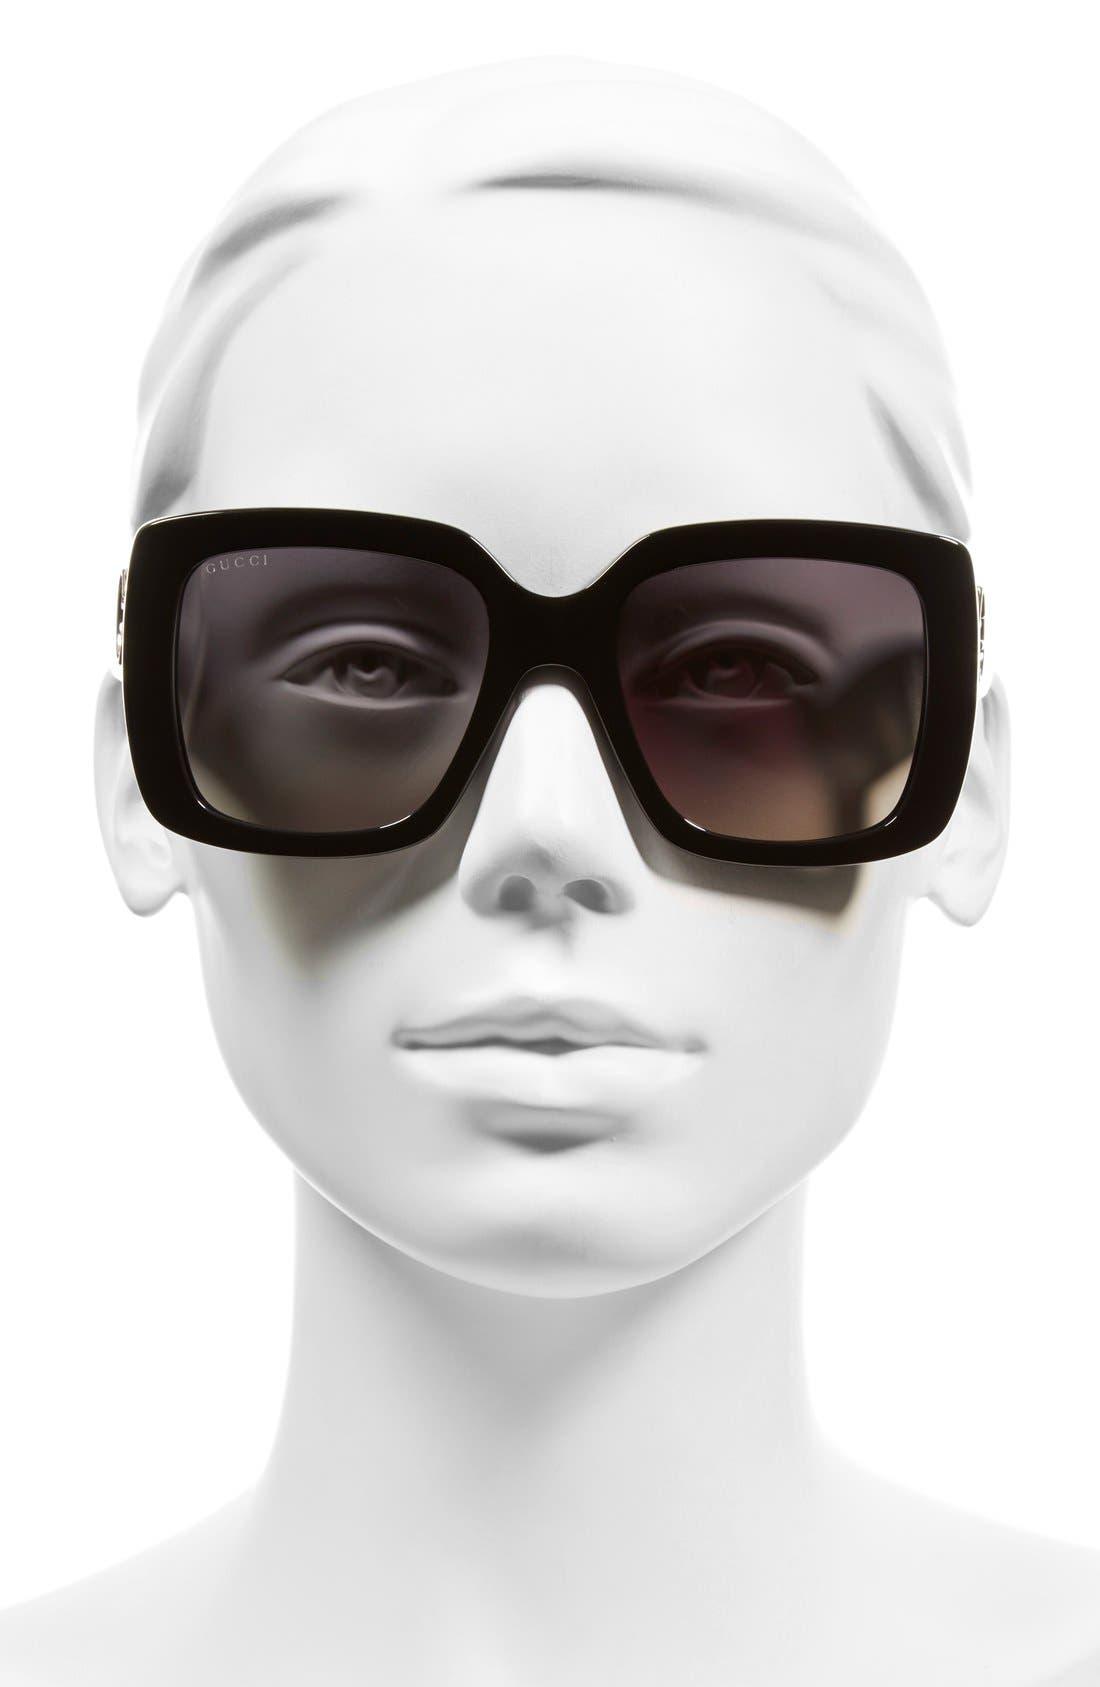 53mm Square Sunglasses,                             Alternate thumbnail 2, color,                             001